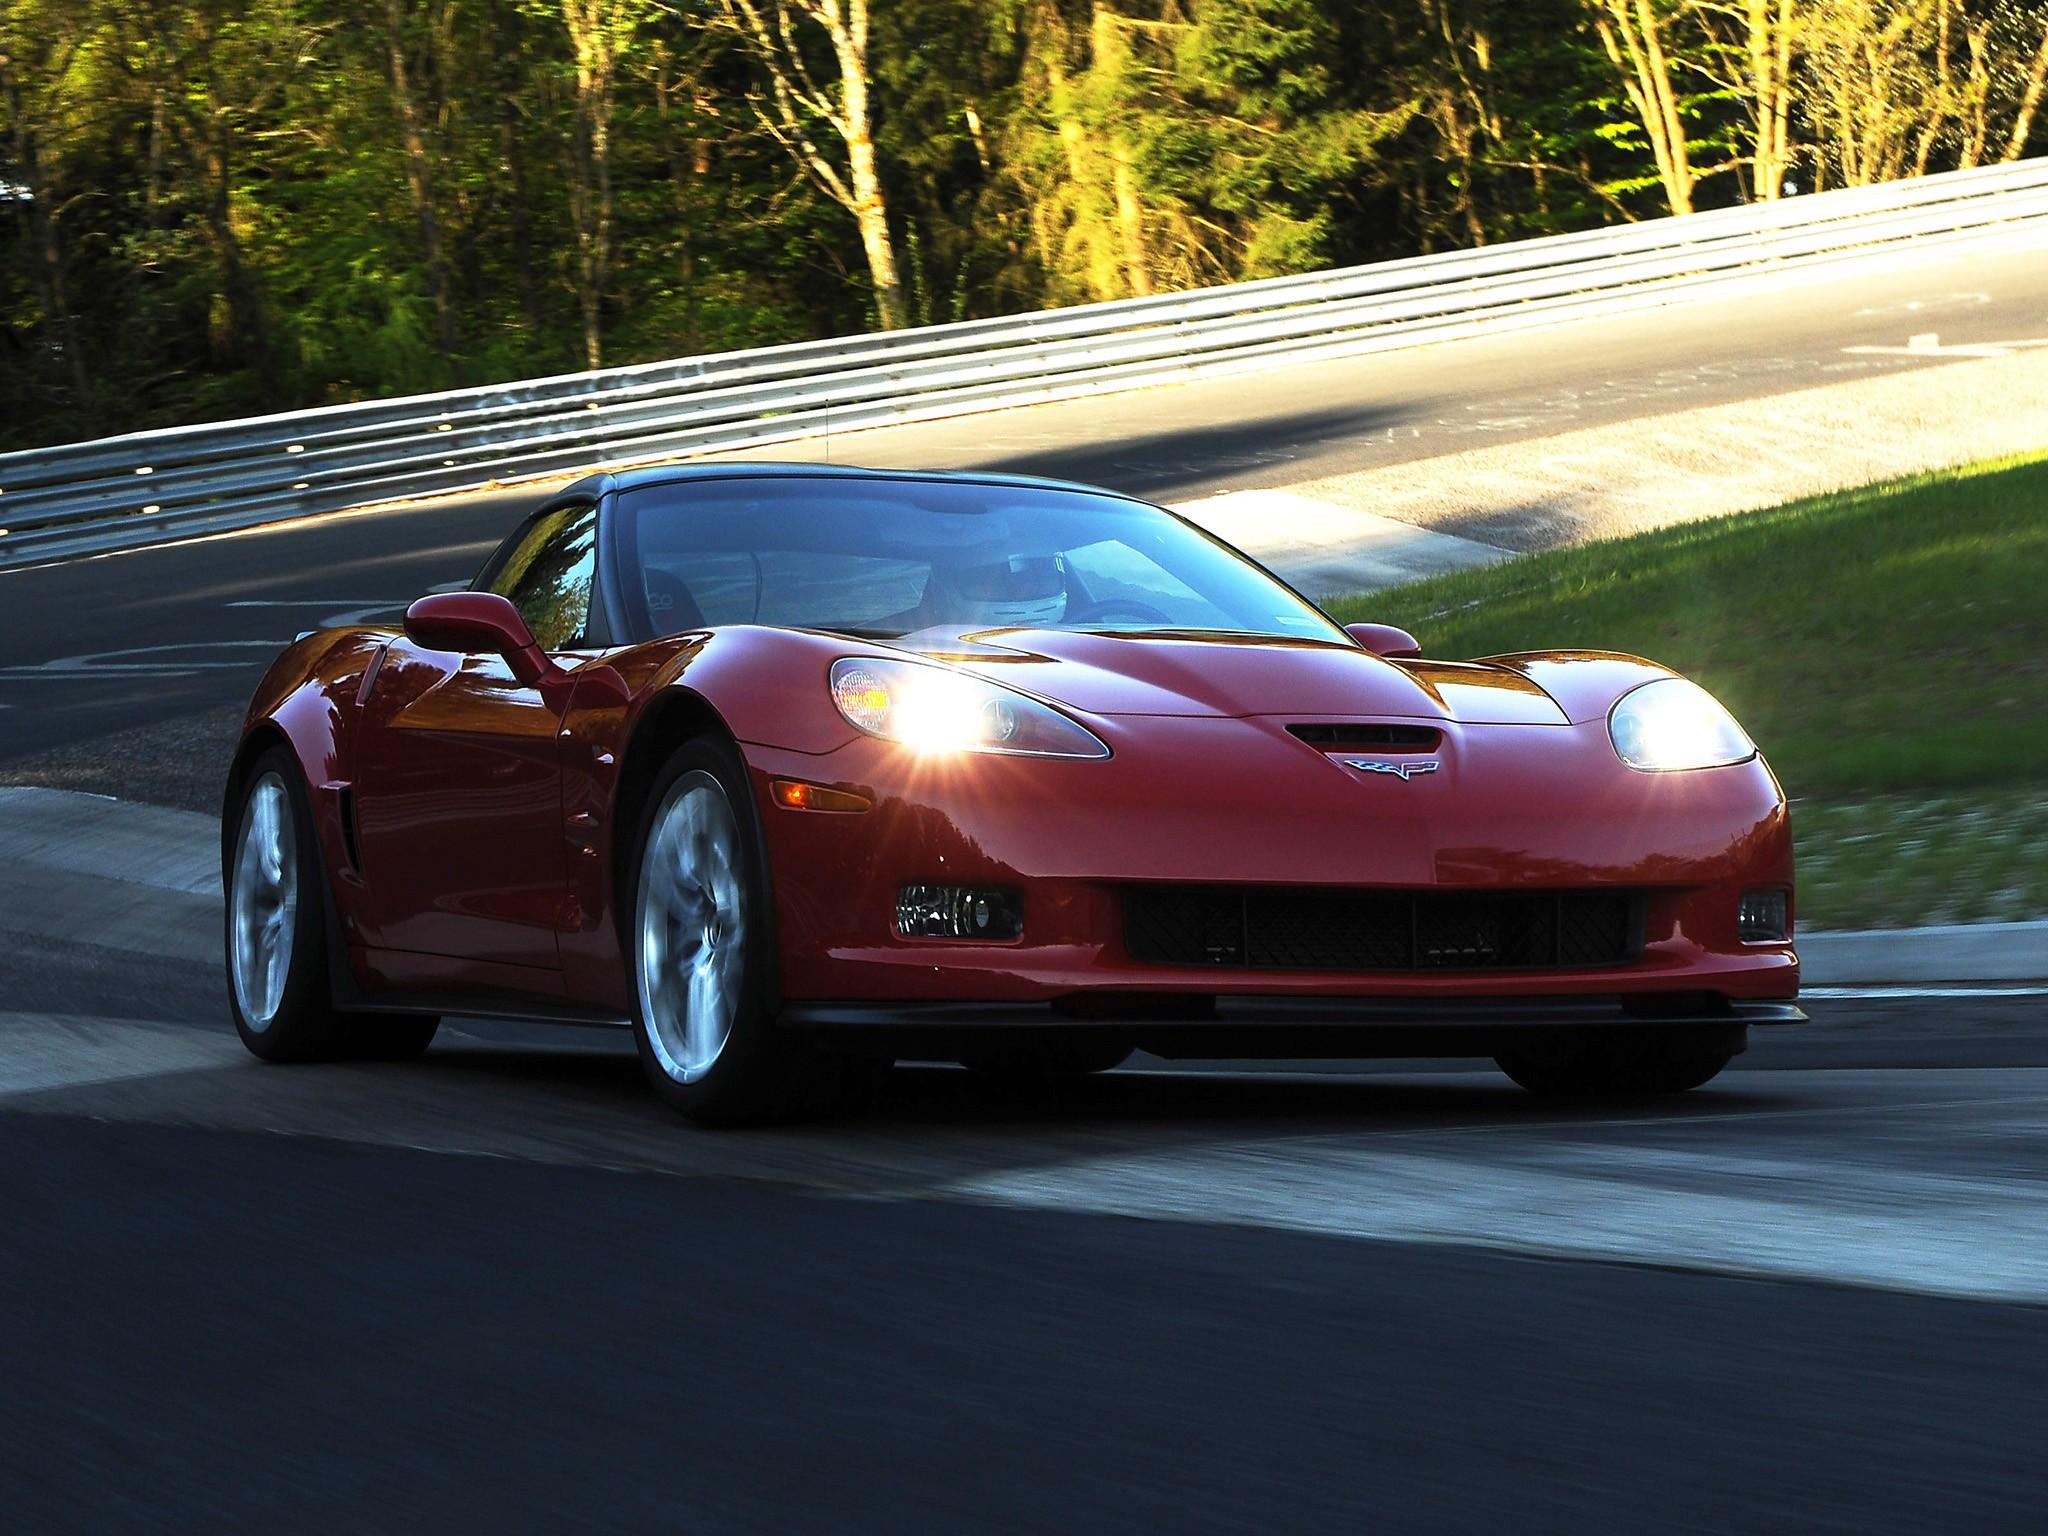 corvette zr1 2008 - photo #22